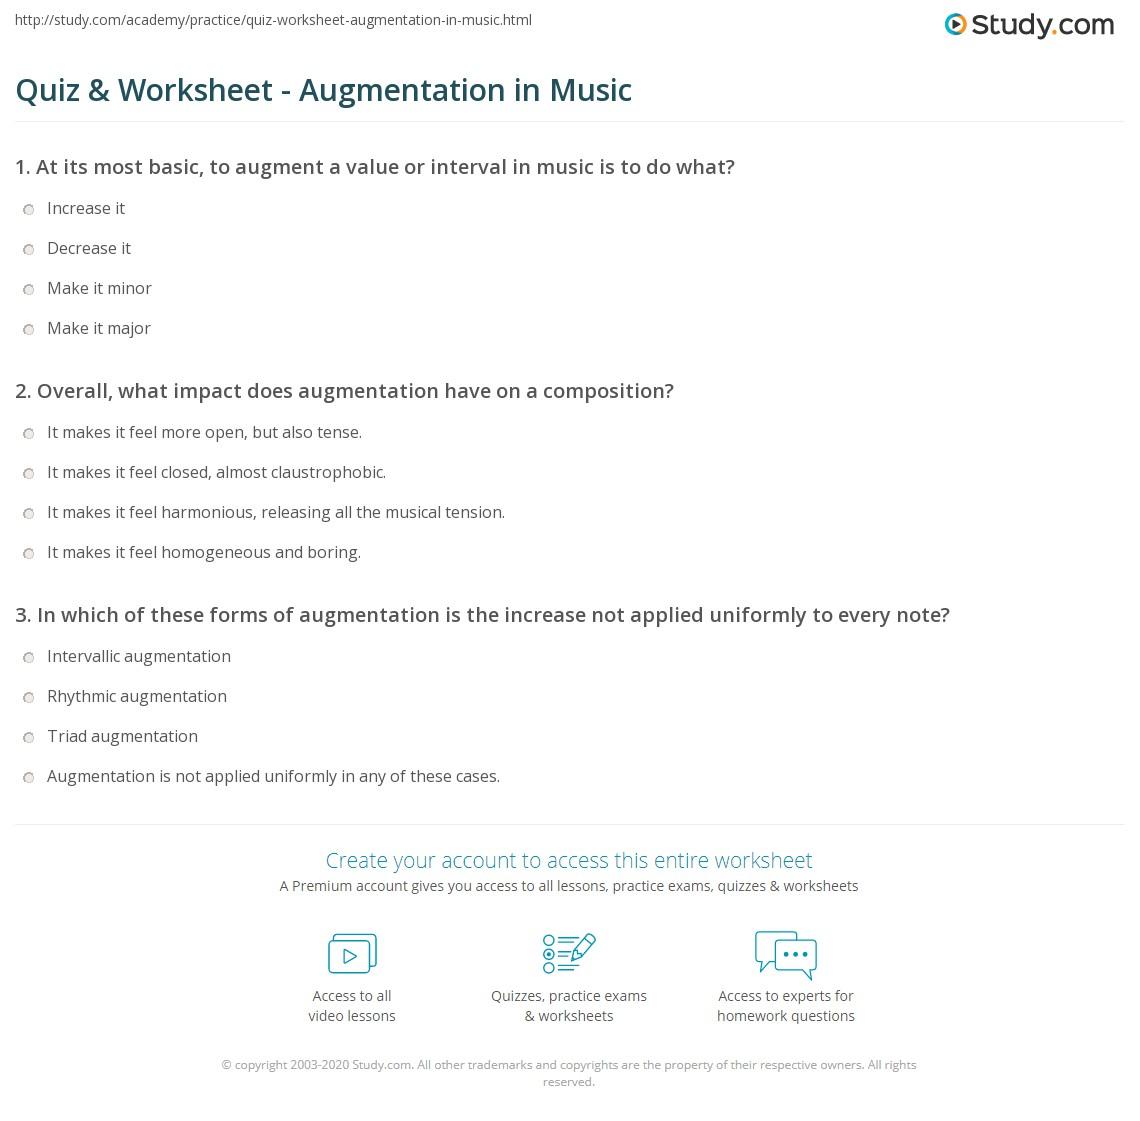 Quiz W Ksheet Ugment Ti Music Study